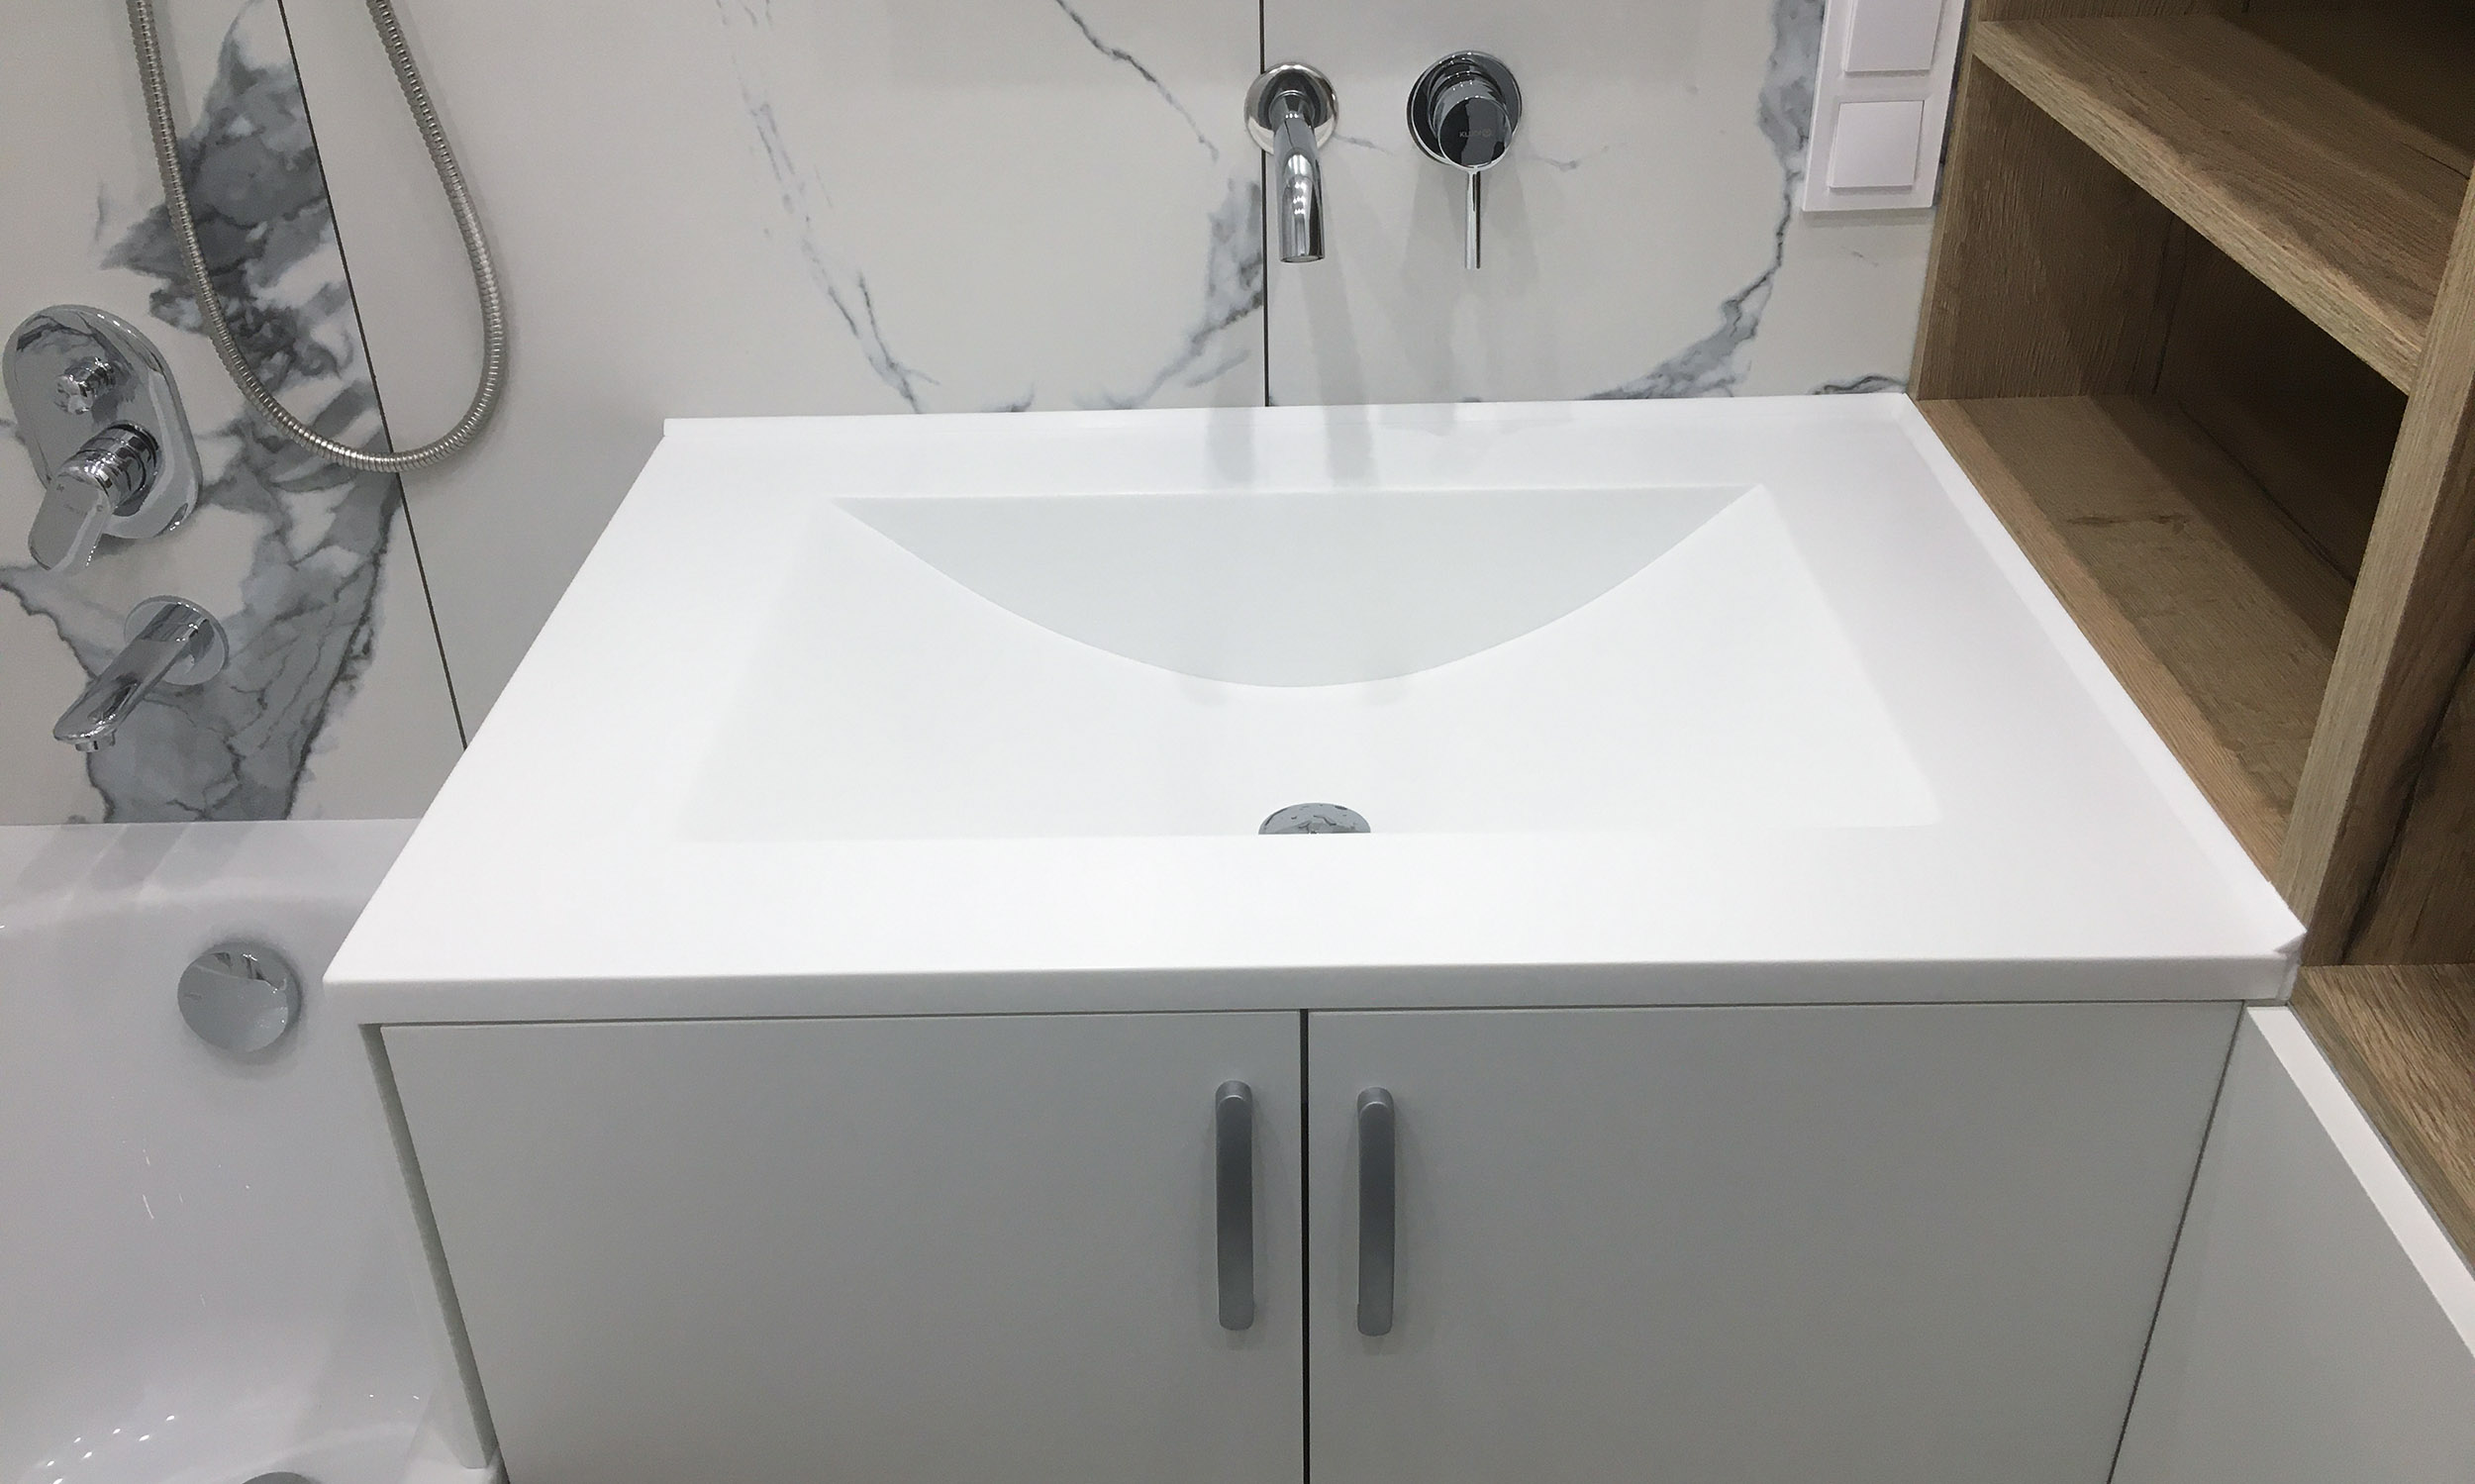 https://mascompany.com.ua/wp-content/uploads/2021/06/stoleshnitsa-s-bokovoy-panelyu-iz-kamnya-grandex-p-104-pure-white-modern-acrylic-stone-main.jpg